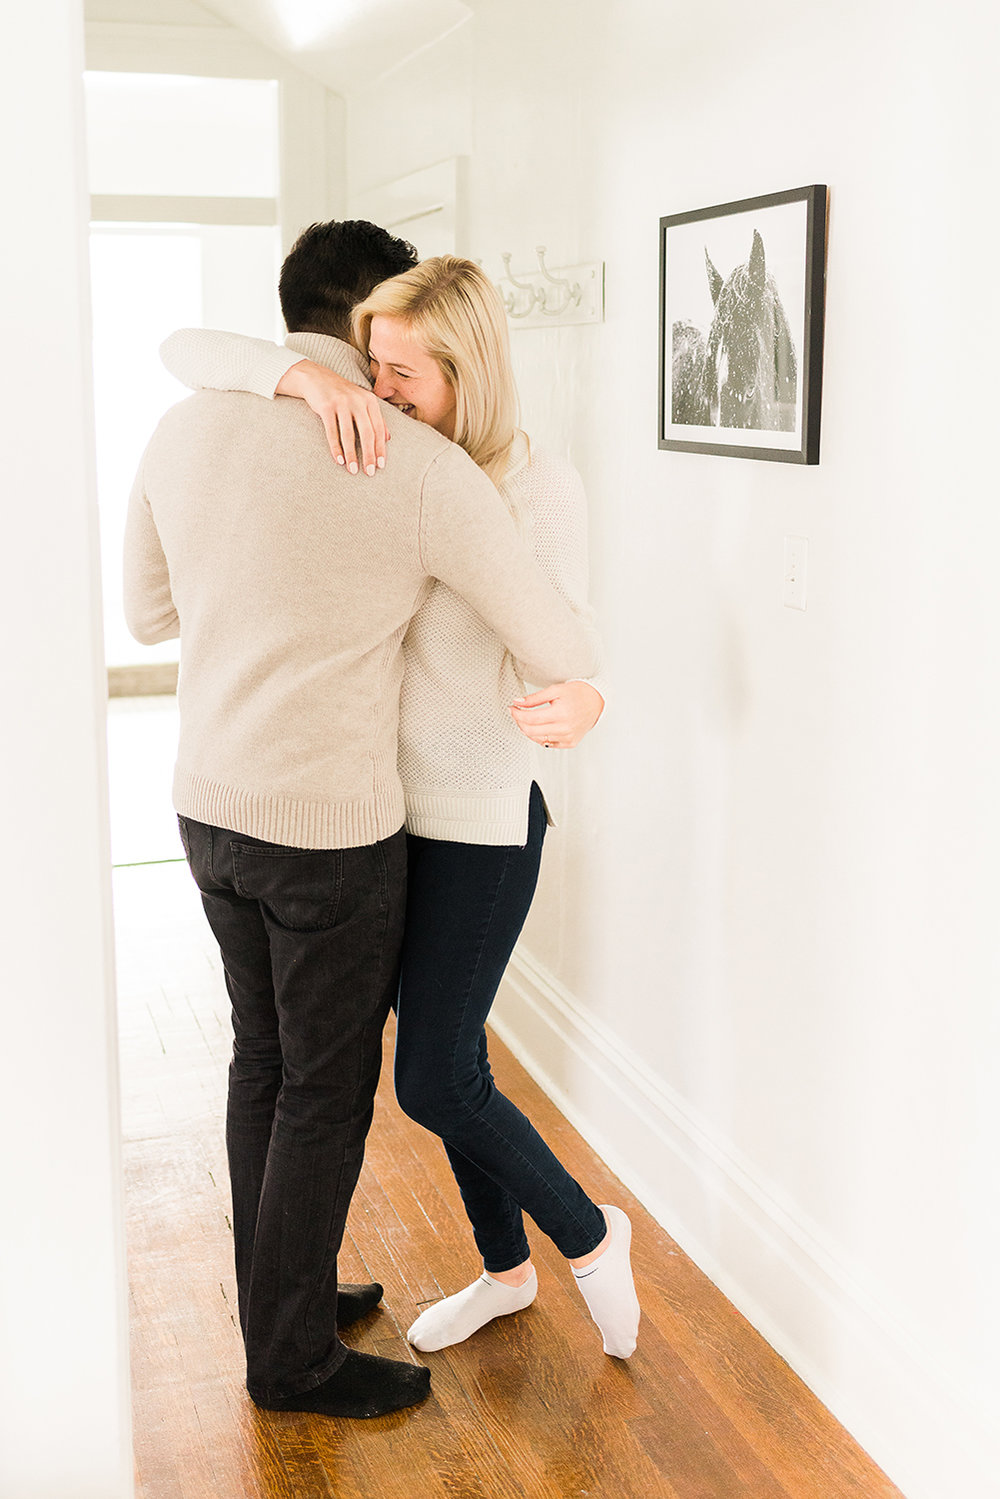 in-home-engagement-session-denver-engagement-photographer_65.jpg